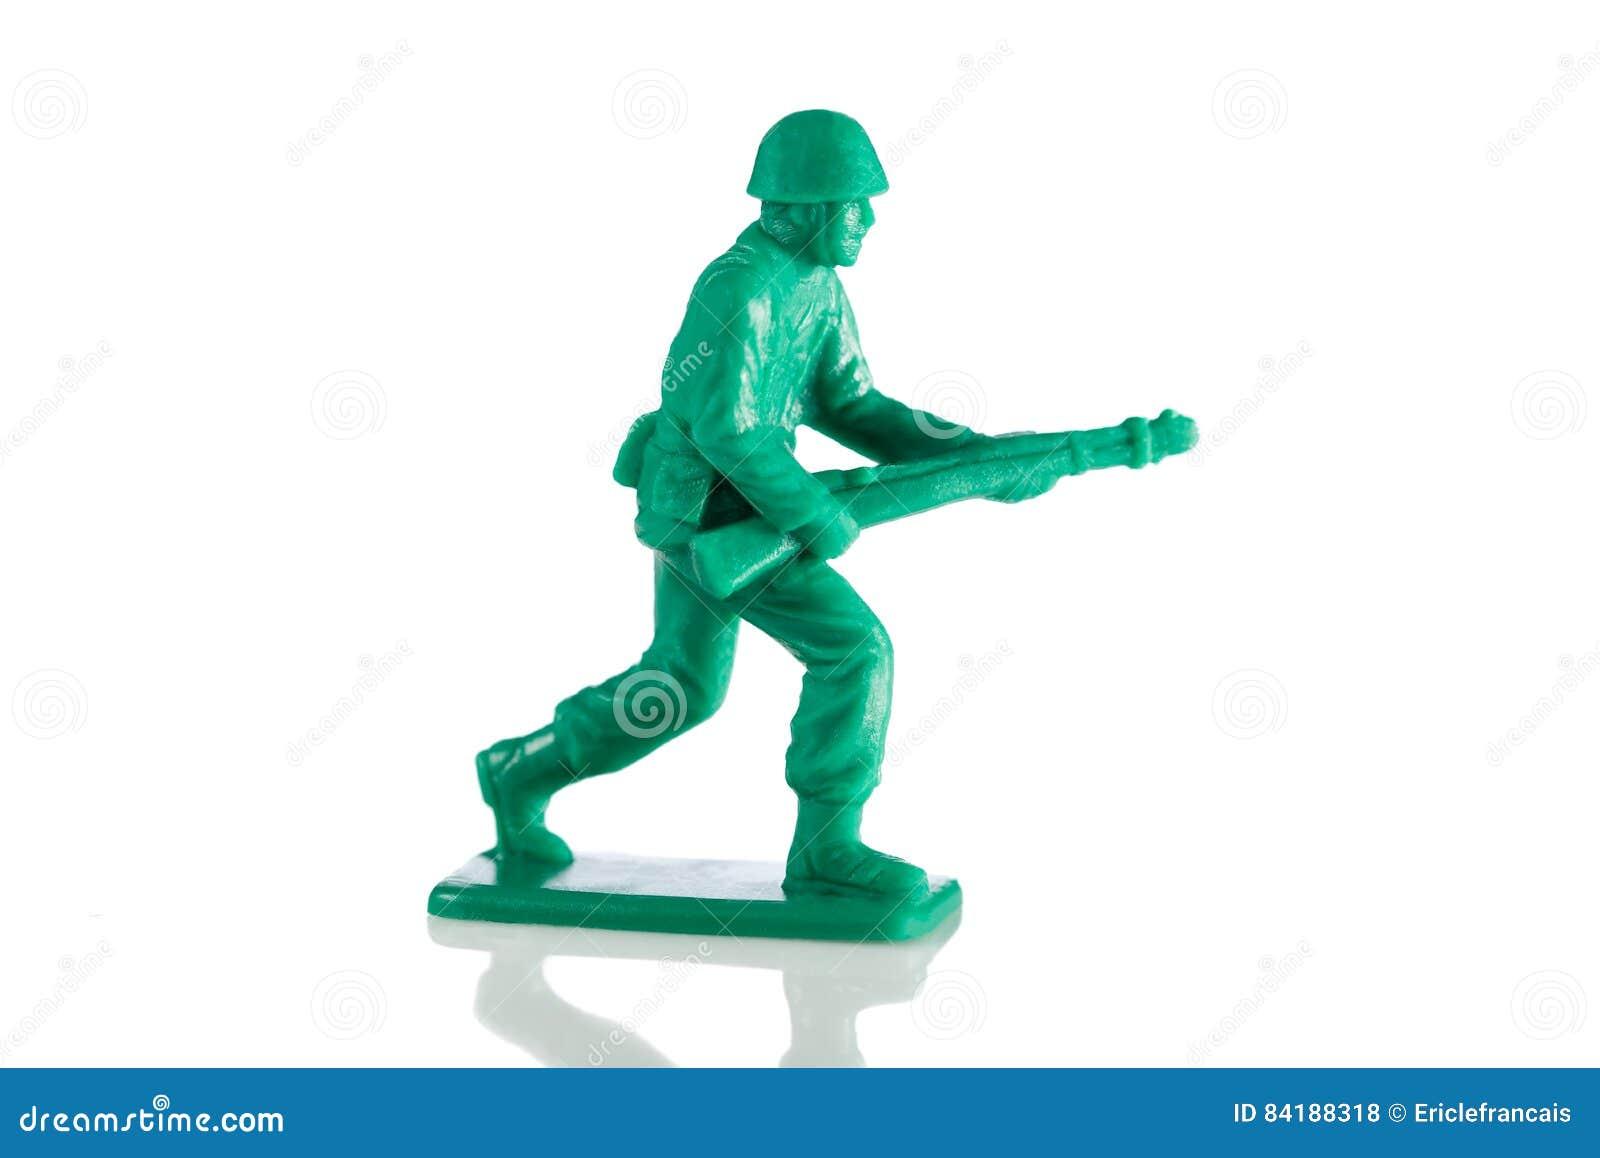 Soldat de jouet de plastique miniature